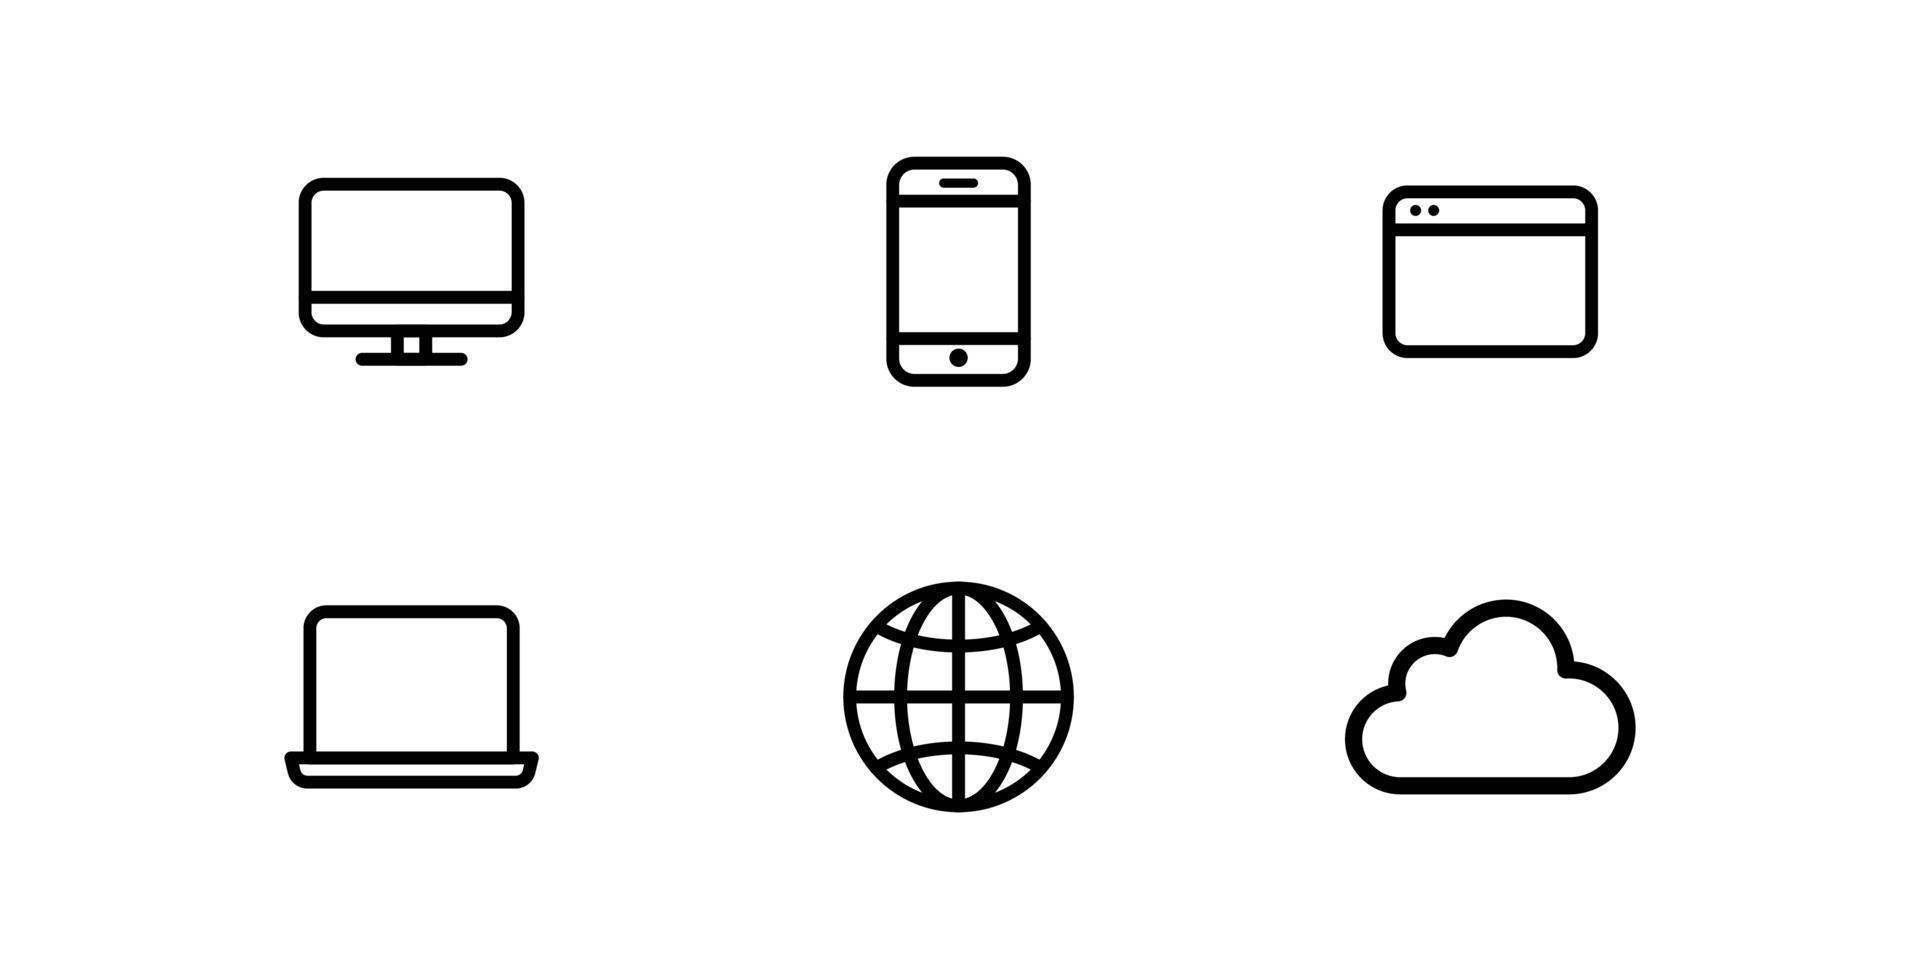 webb mobiltelefon dator nätverk viktiga ikoner pack samling gratis vektorer